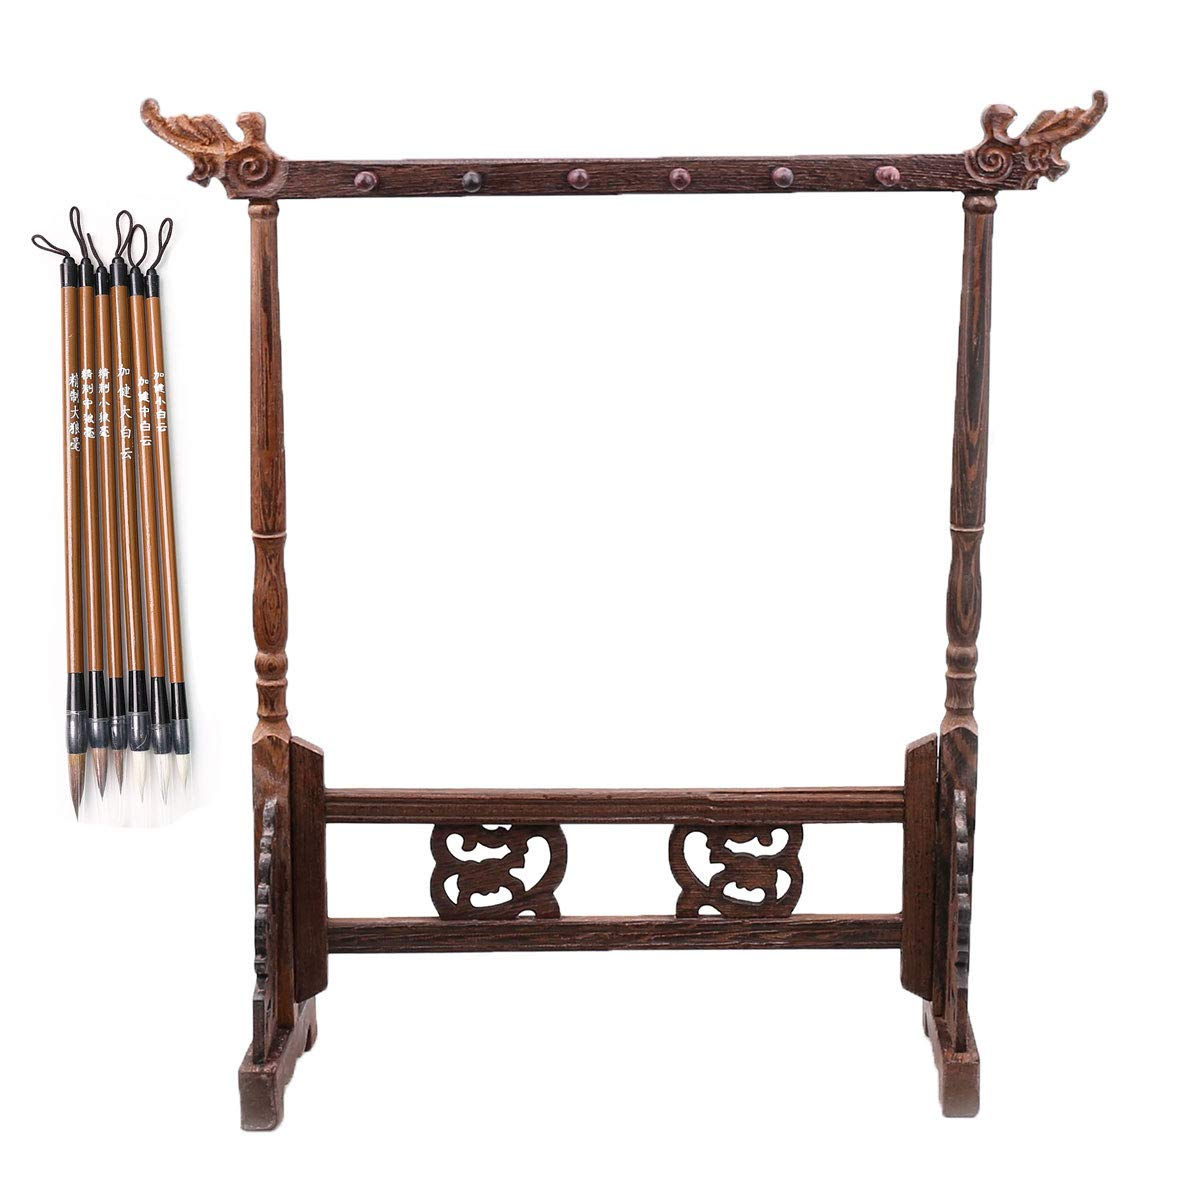 Fathers Day Gift,12-pin wenge Brush Holder//Wood Penholder Pen Hanging//Calligraphy Rosewood 12 Pin Calligraphy Sumi Drawing Kanji Brush Pen Hanger